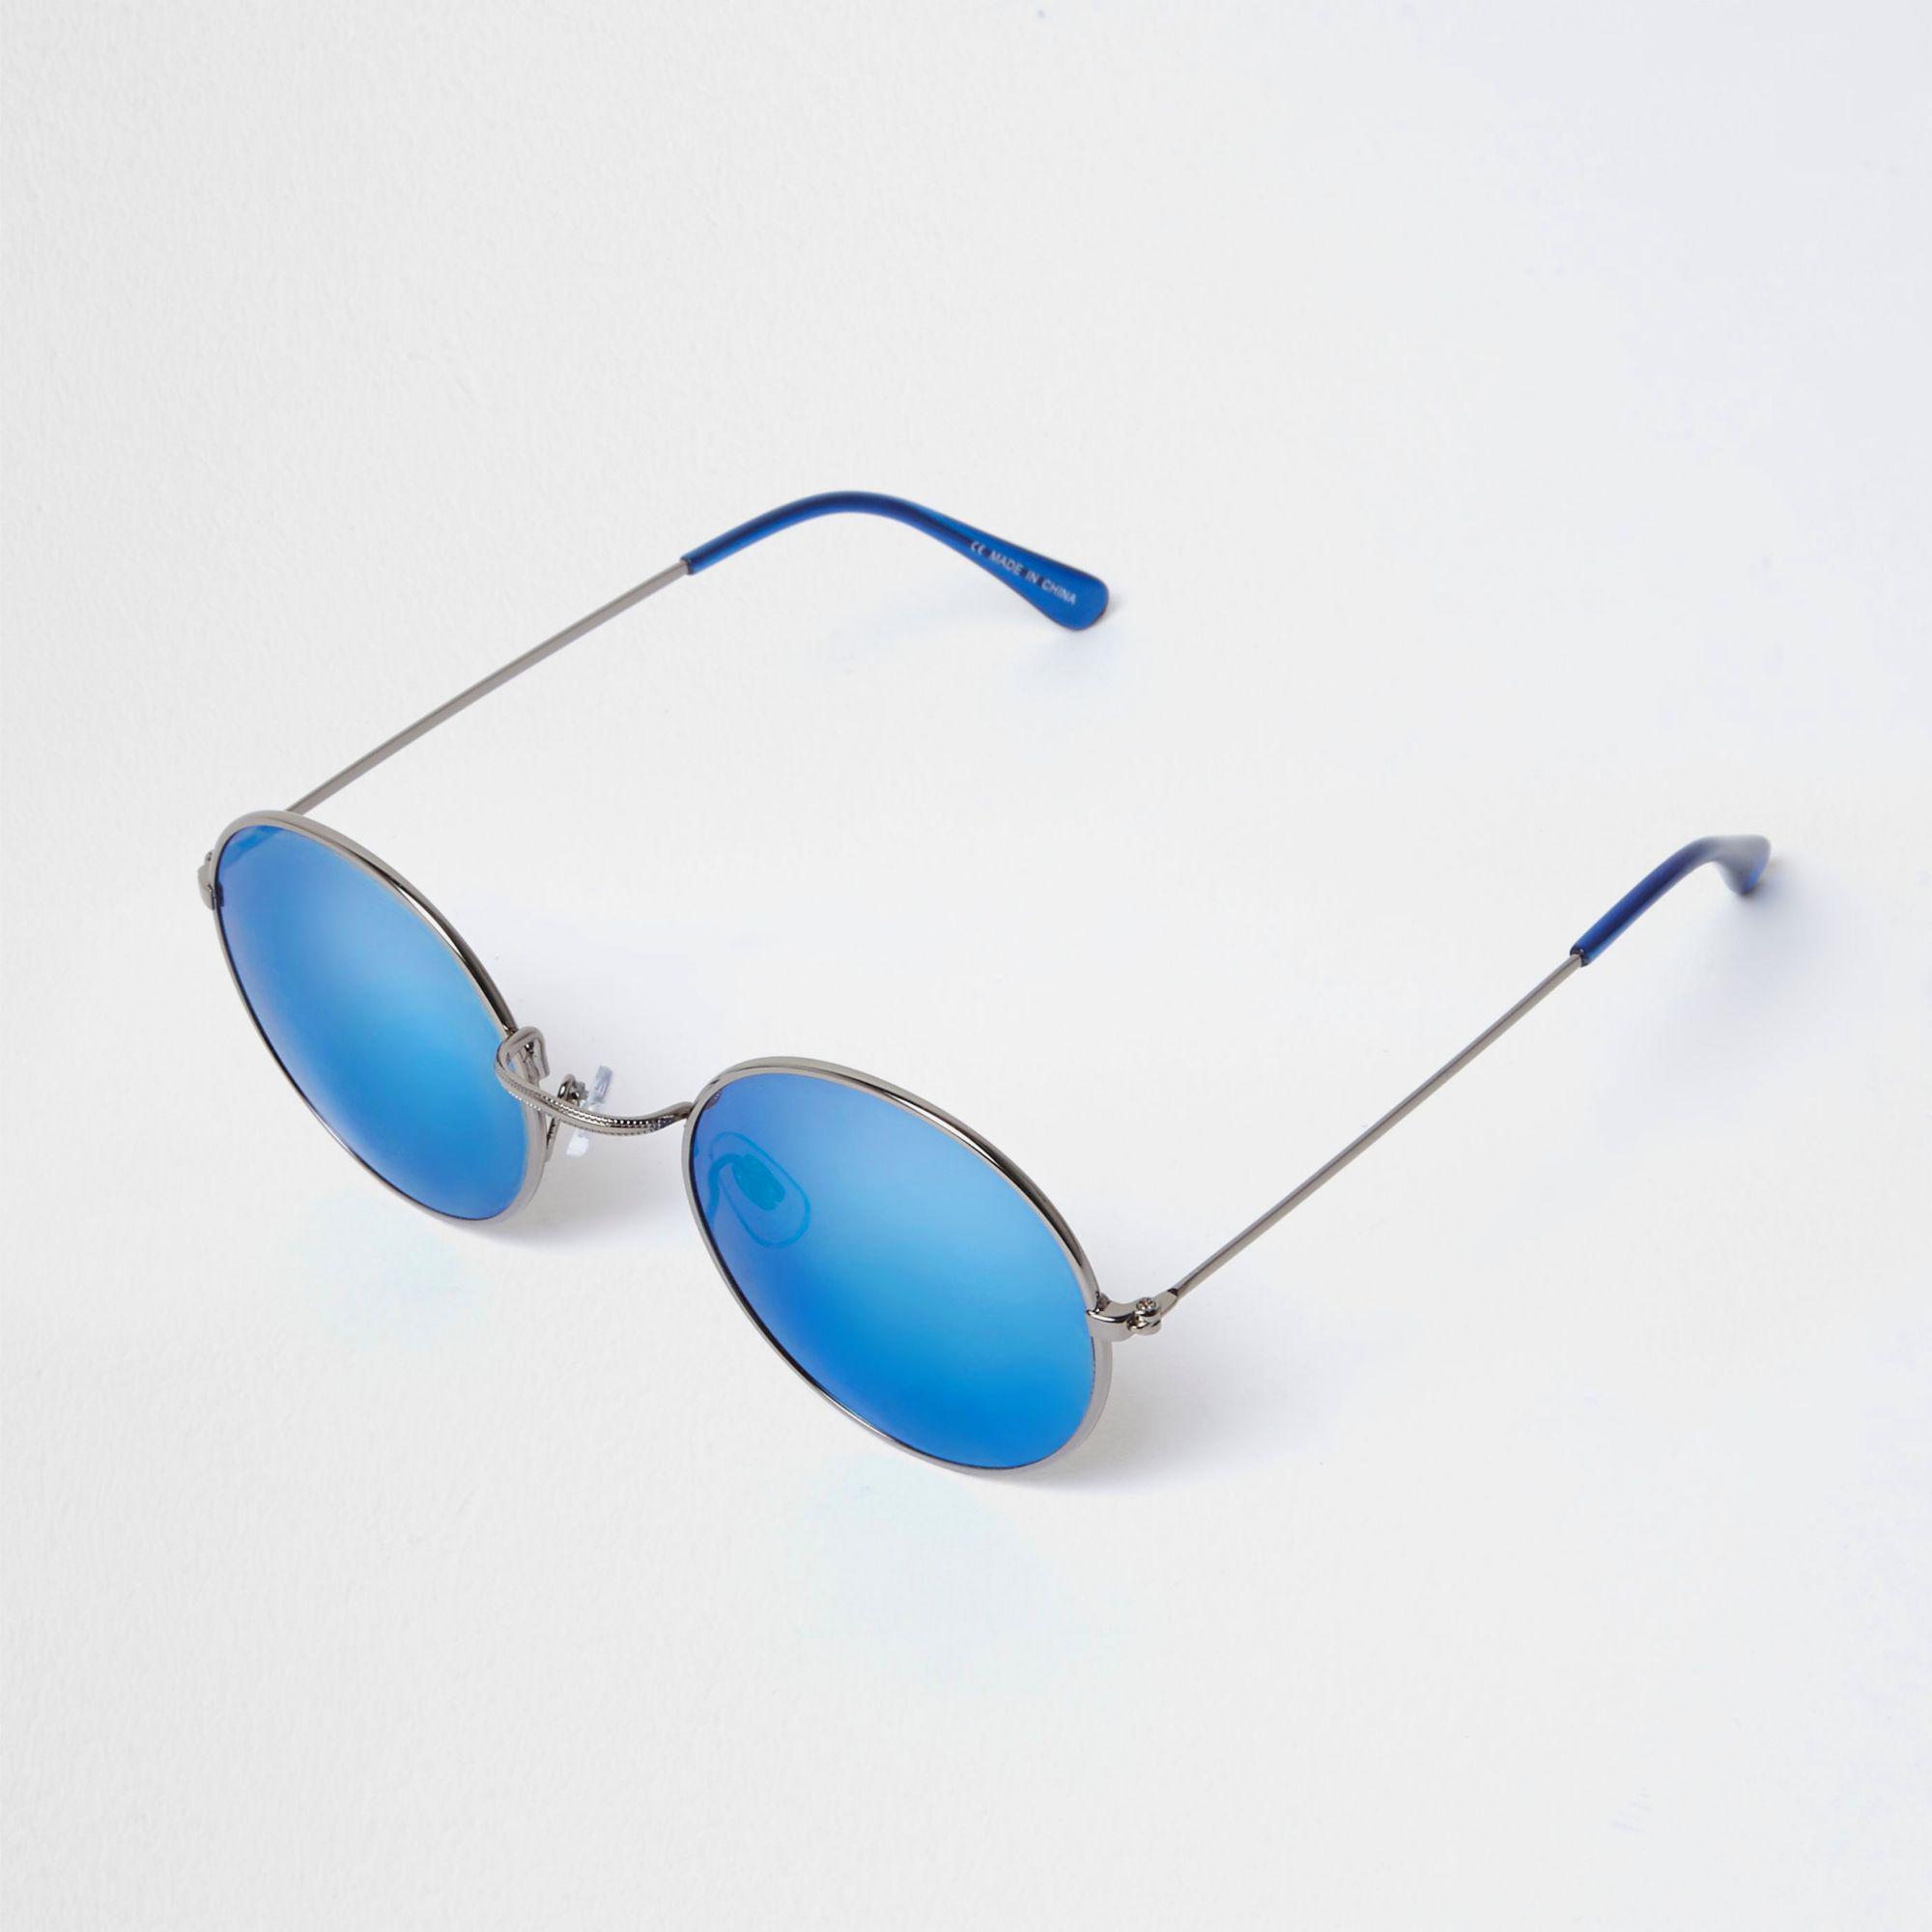 89d1808c80 River Island Circle Lens Blue Mirror Sunglasses in Metallic for Men ...